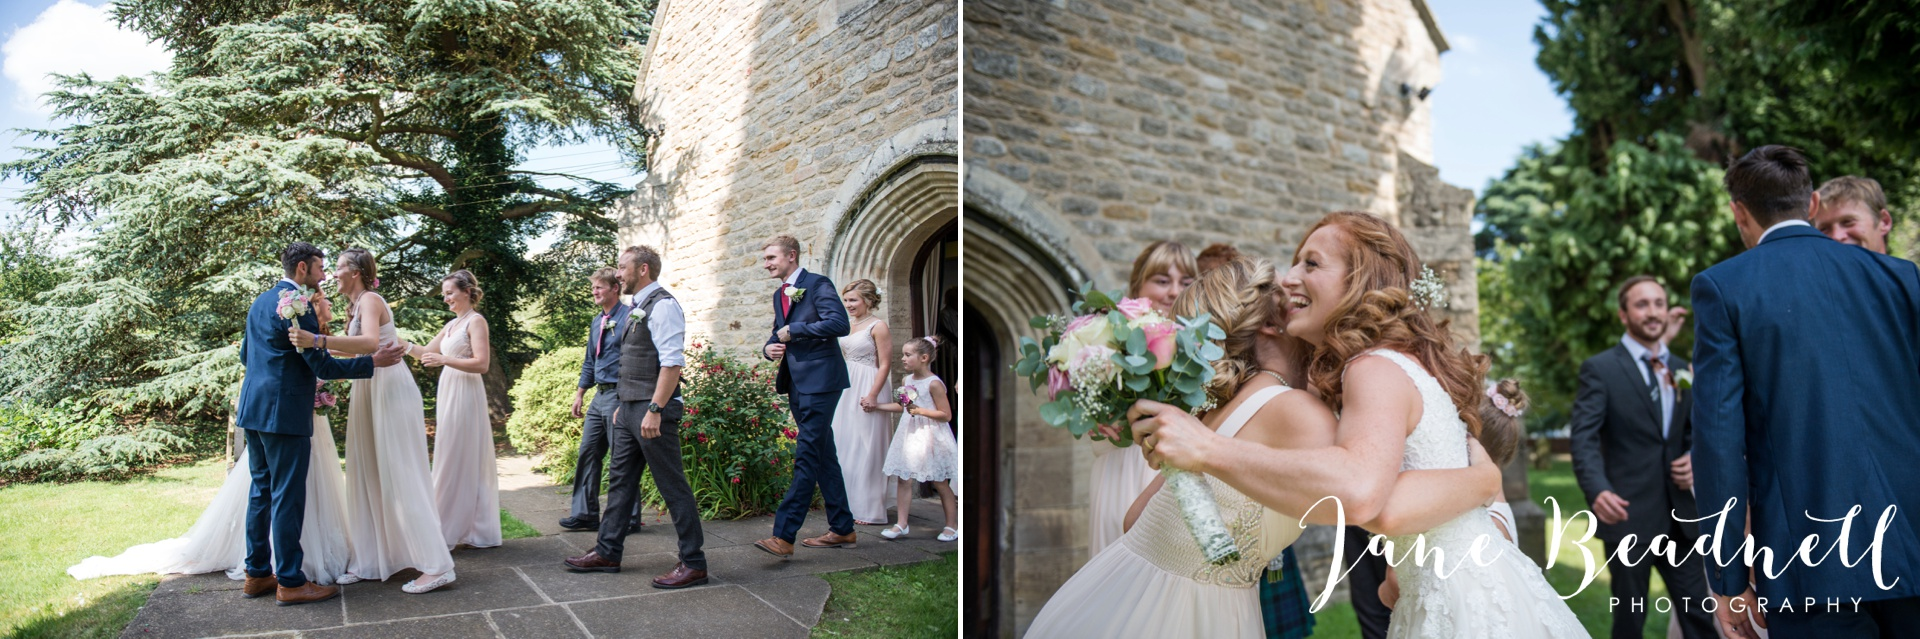 yorkshire-fine-art-wedding-photographer-jane-beadnell-photography-poppleton-york_0059